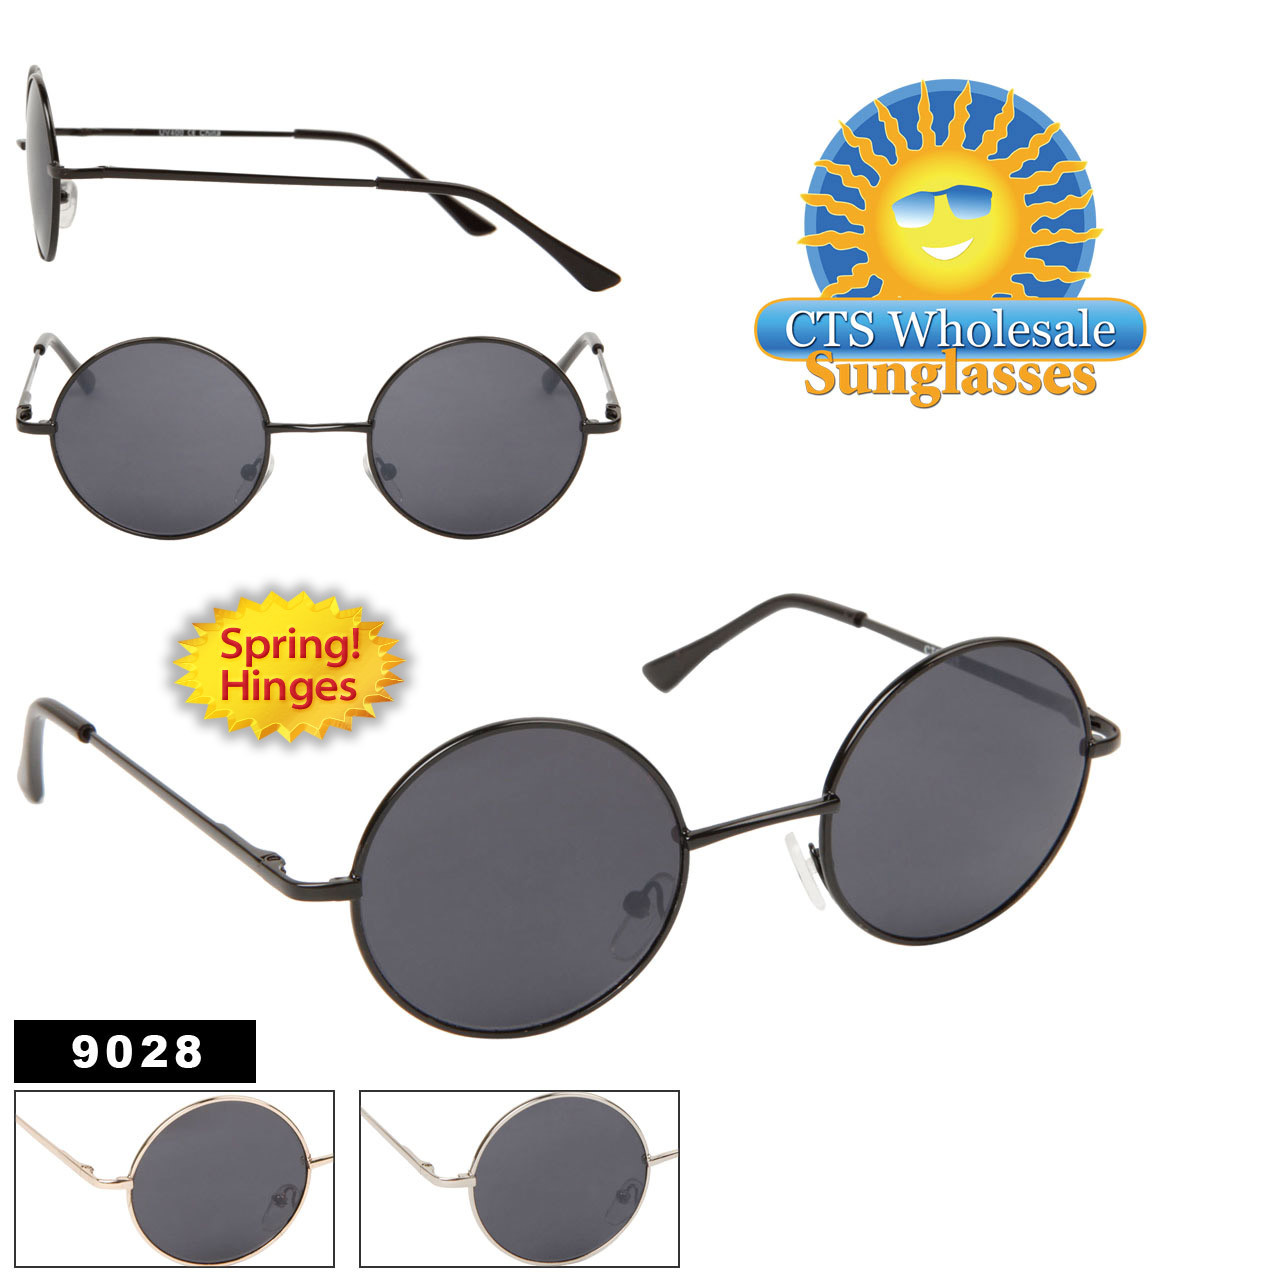 John Lennon Inspired Sunglasses Wholesale - Style #9028 Spring Hinge (Assorted Colors) (12 pcs.)